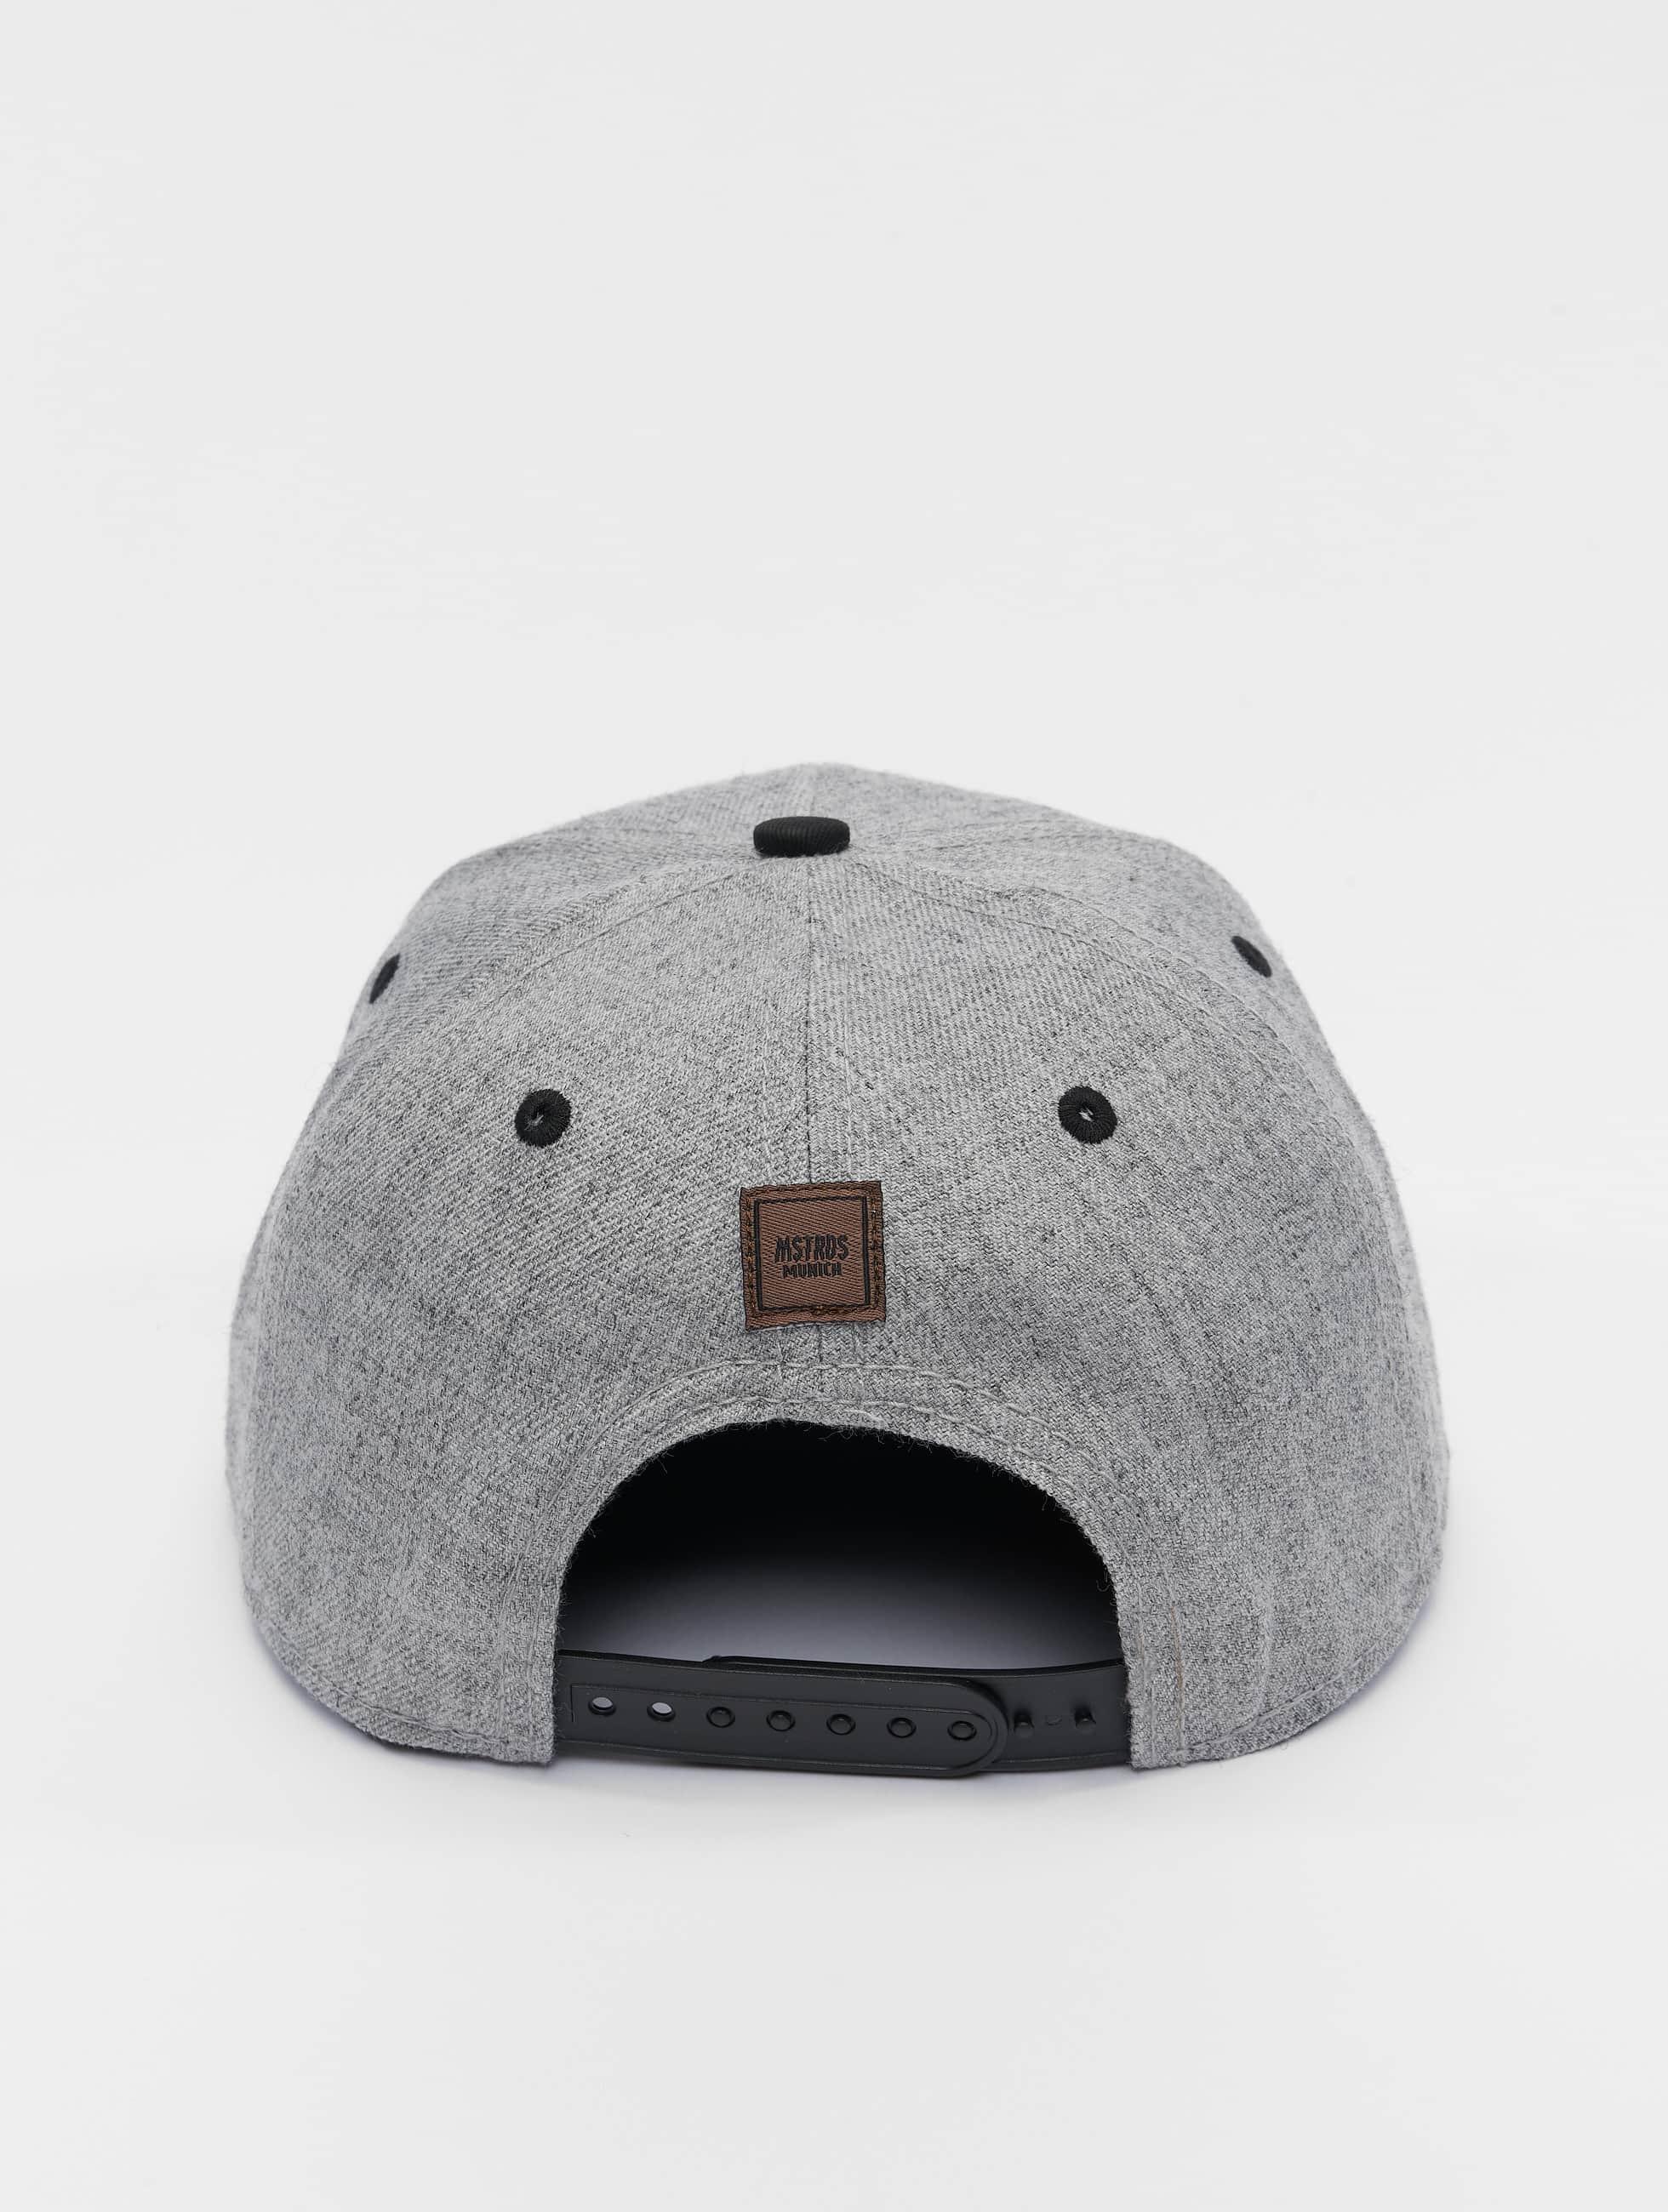 MSTRDS Casquette Snapback & Strapback A Letter gris